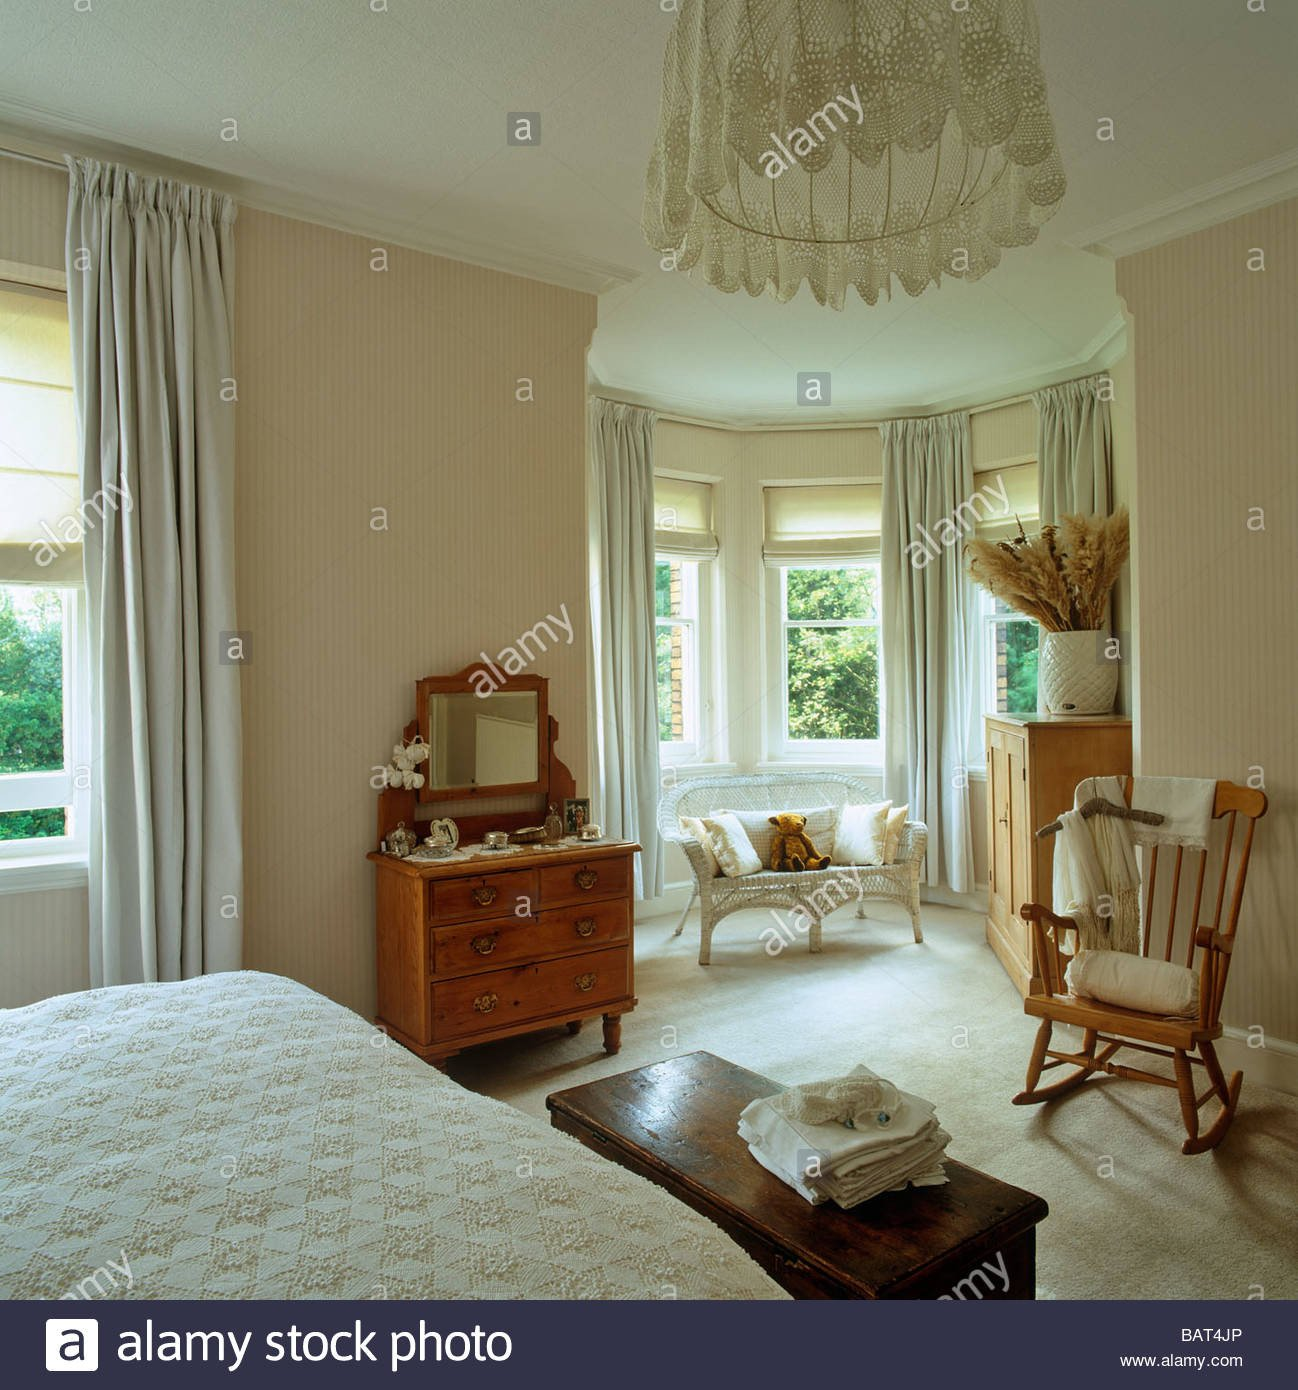 Rustic Pine Bedroom Furniture Fresh Pine Bedroom Furniture Stock S & Pine Bedroom Furniture